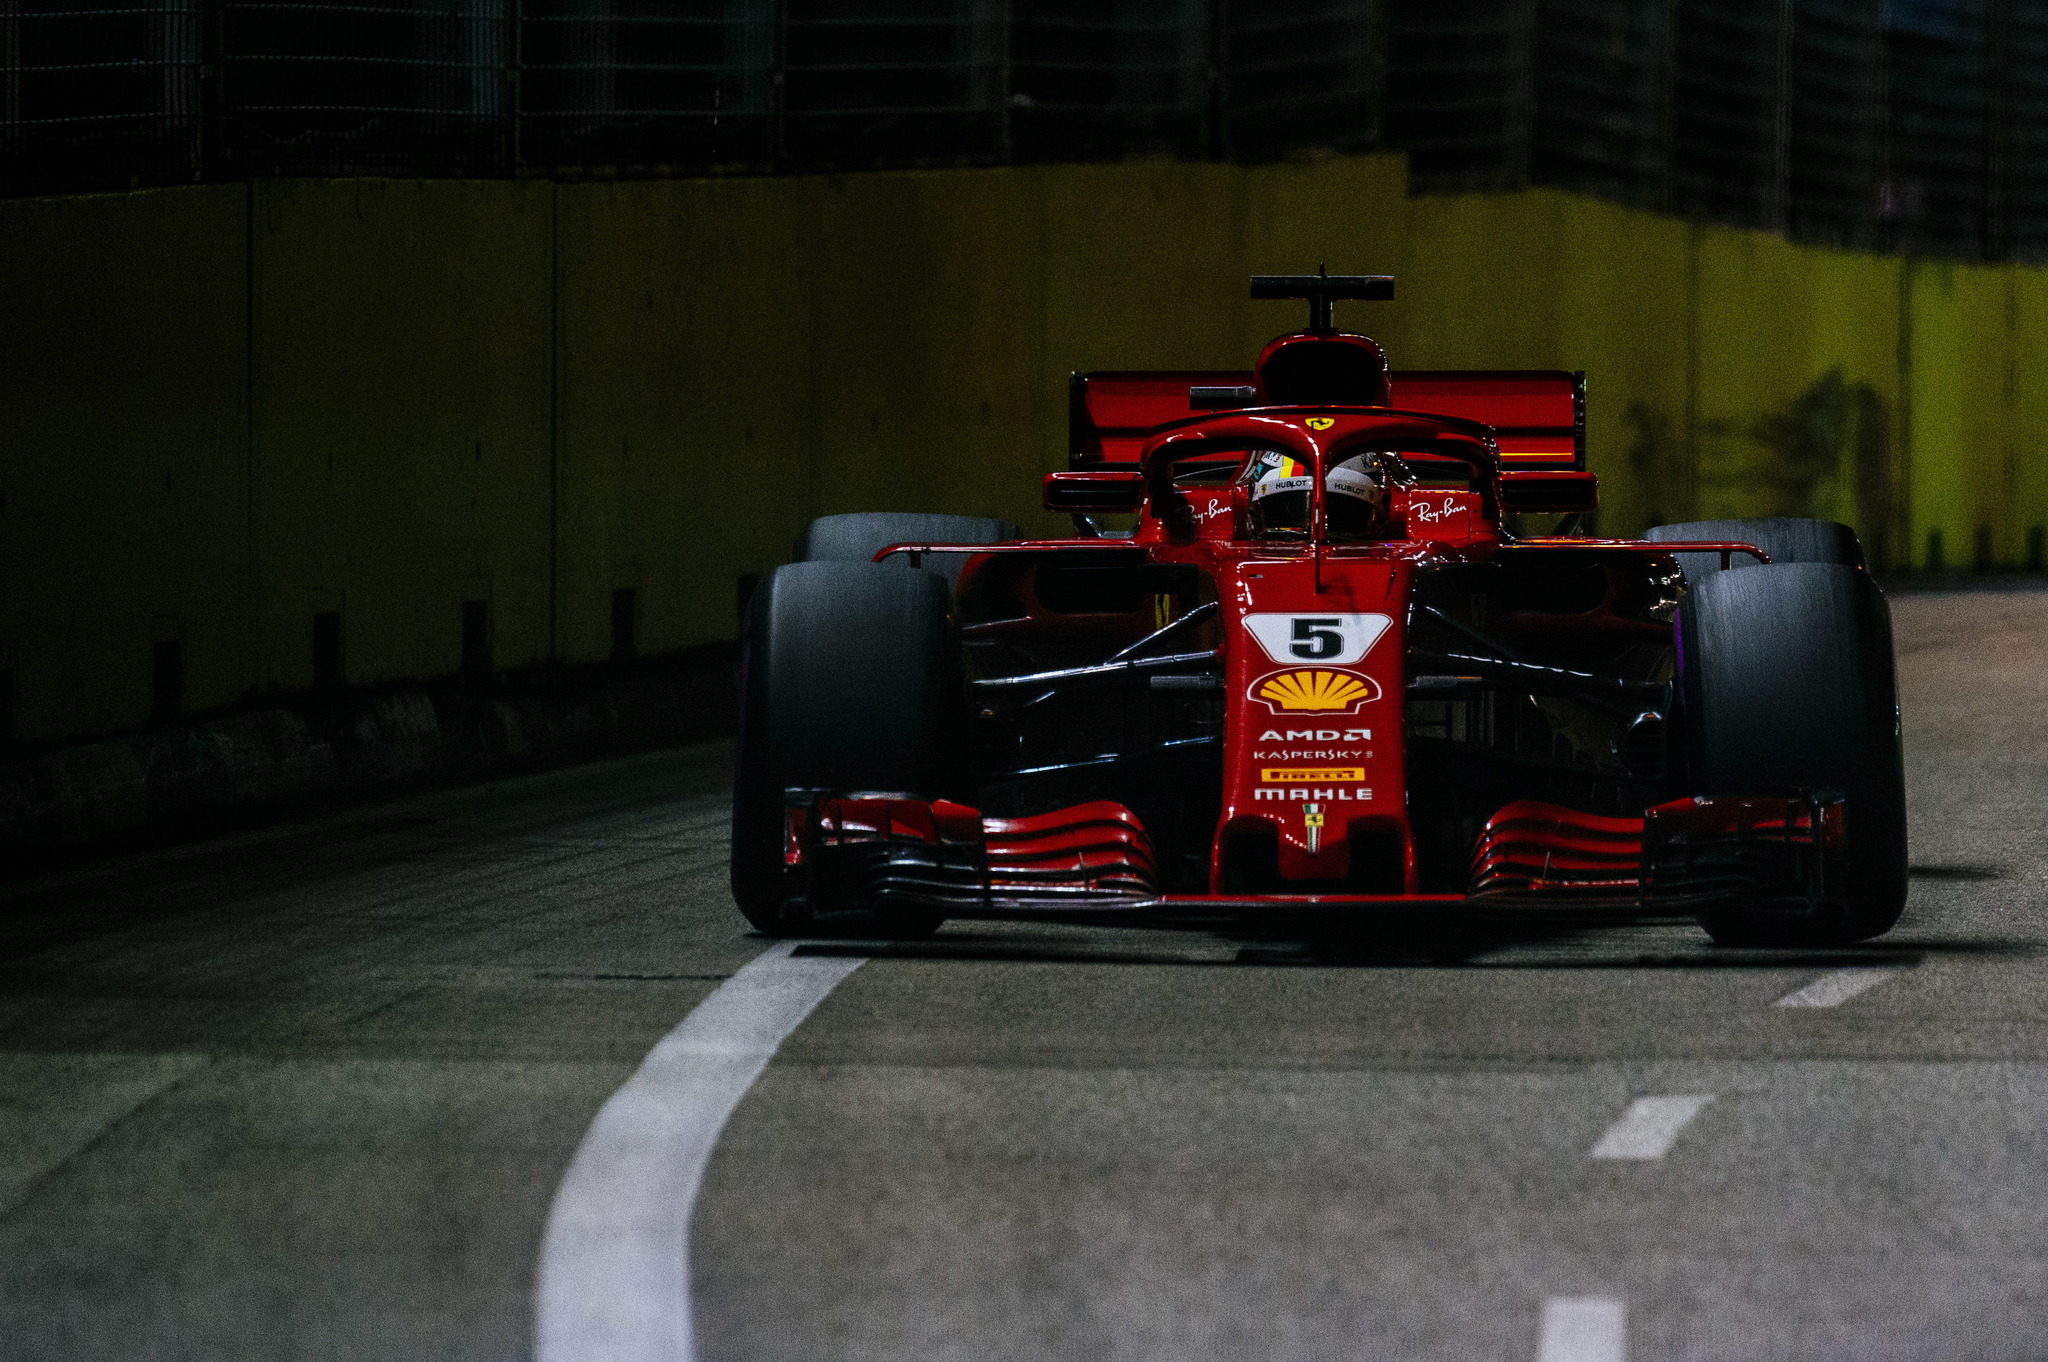 Sebastian Vettel, <HIT>Ferrari</HIT> SF71H. Gran Premio de <HIT>Singapur</HIT> 2018. 15ª prueba del mundial. Circuito callejero de Marina Bay, <HIT>Singapur</HIT>. Domingo 16 de Septiembre, 2018